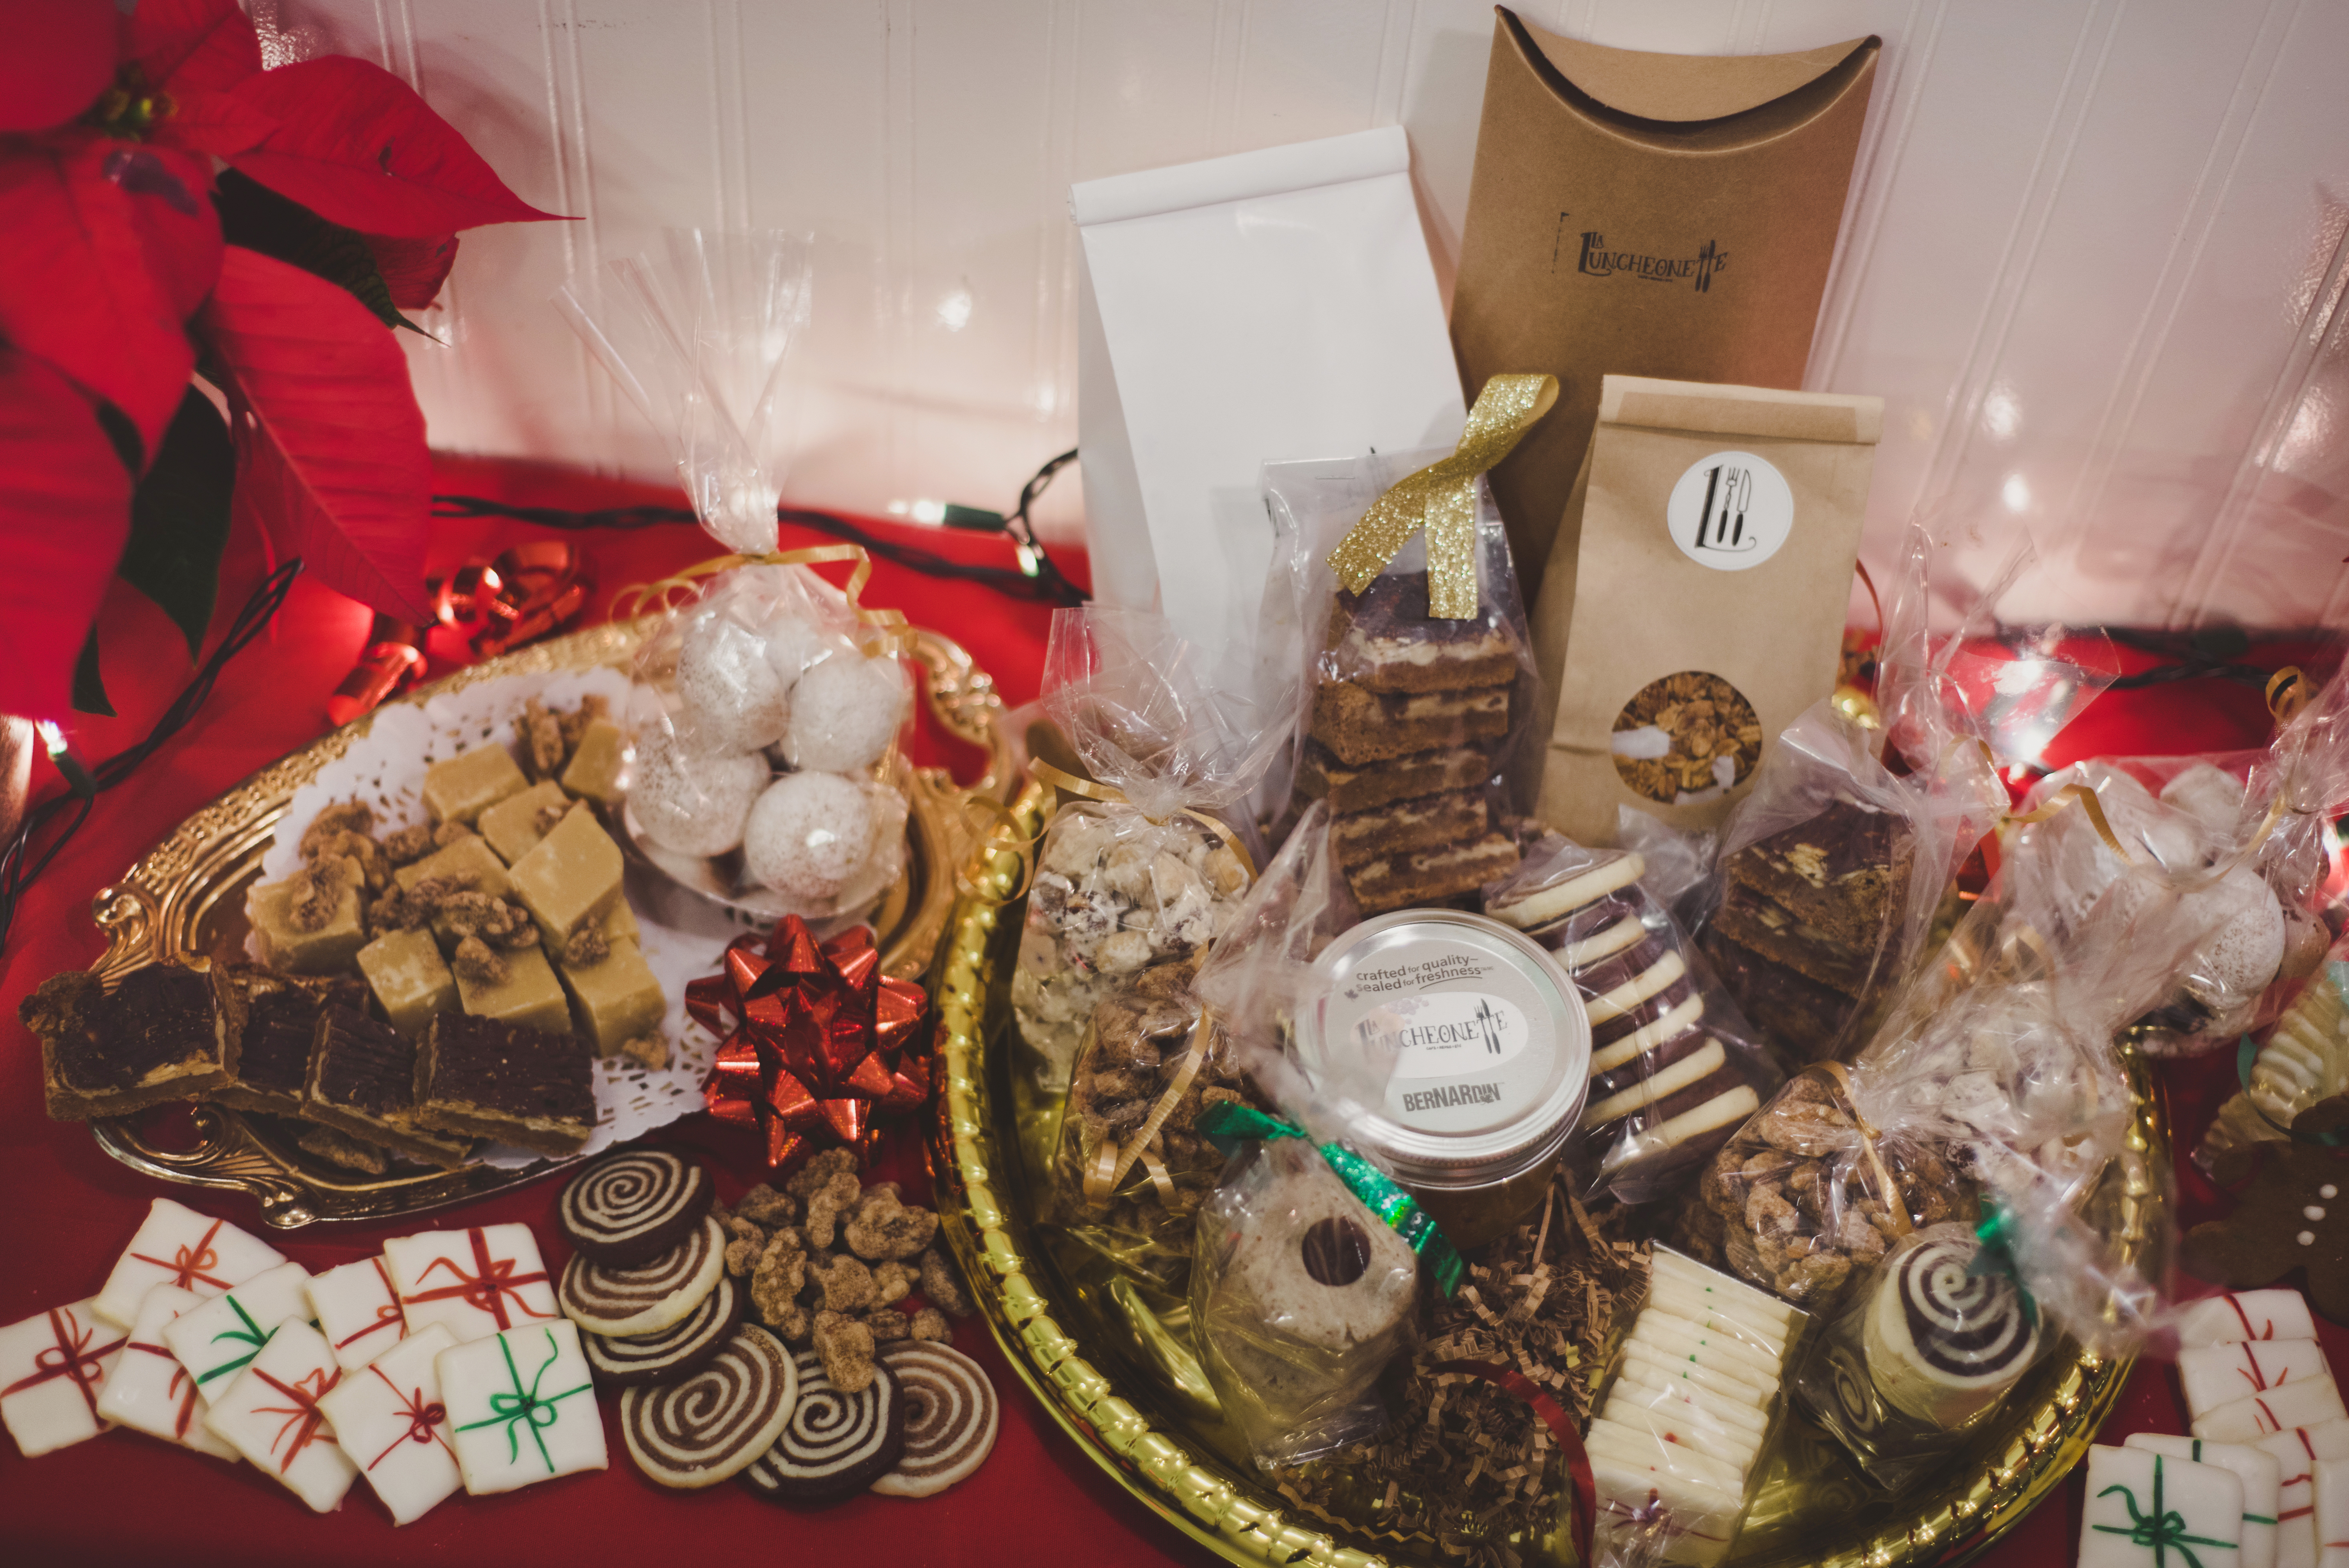 Majestic Holiday Basket of baked goods